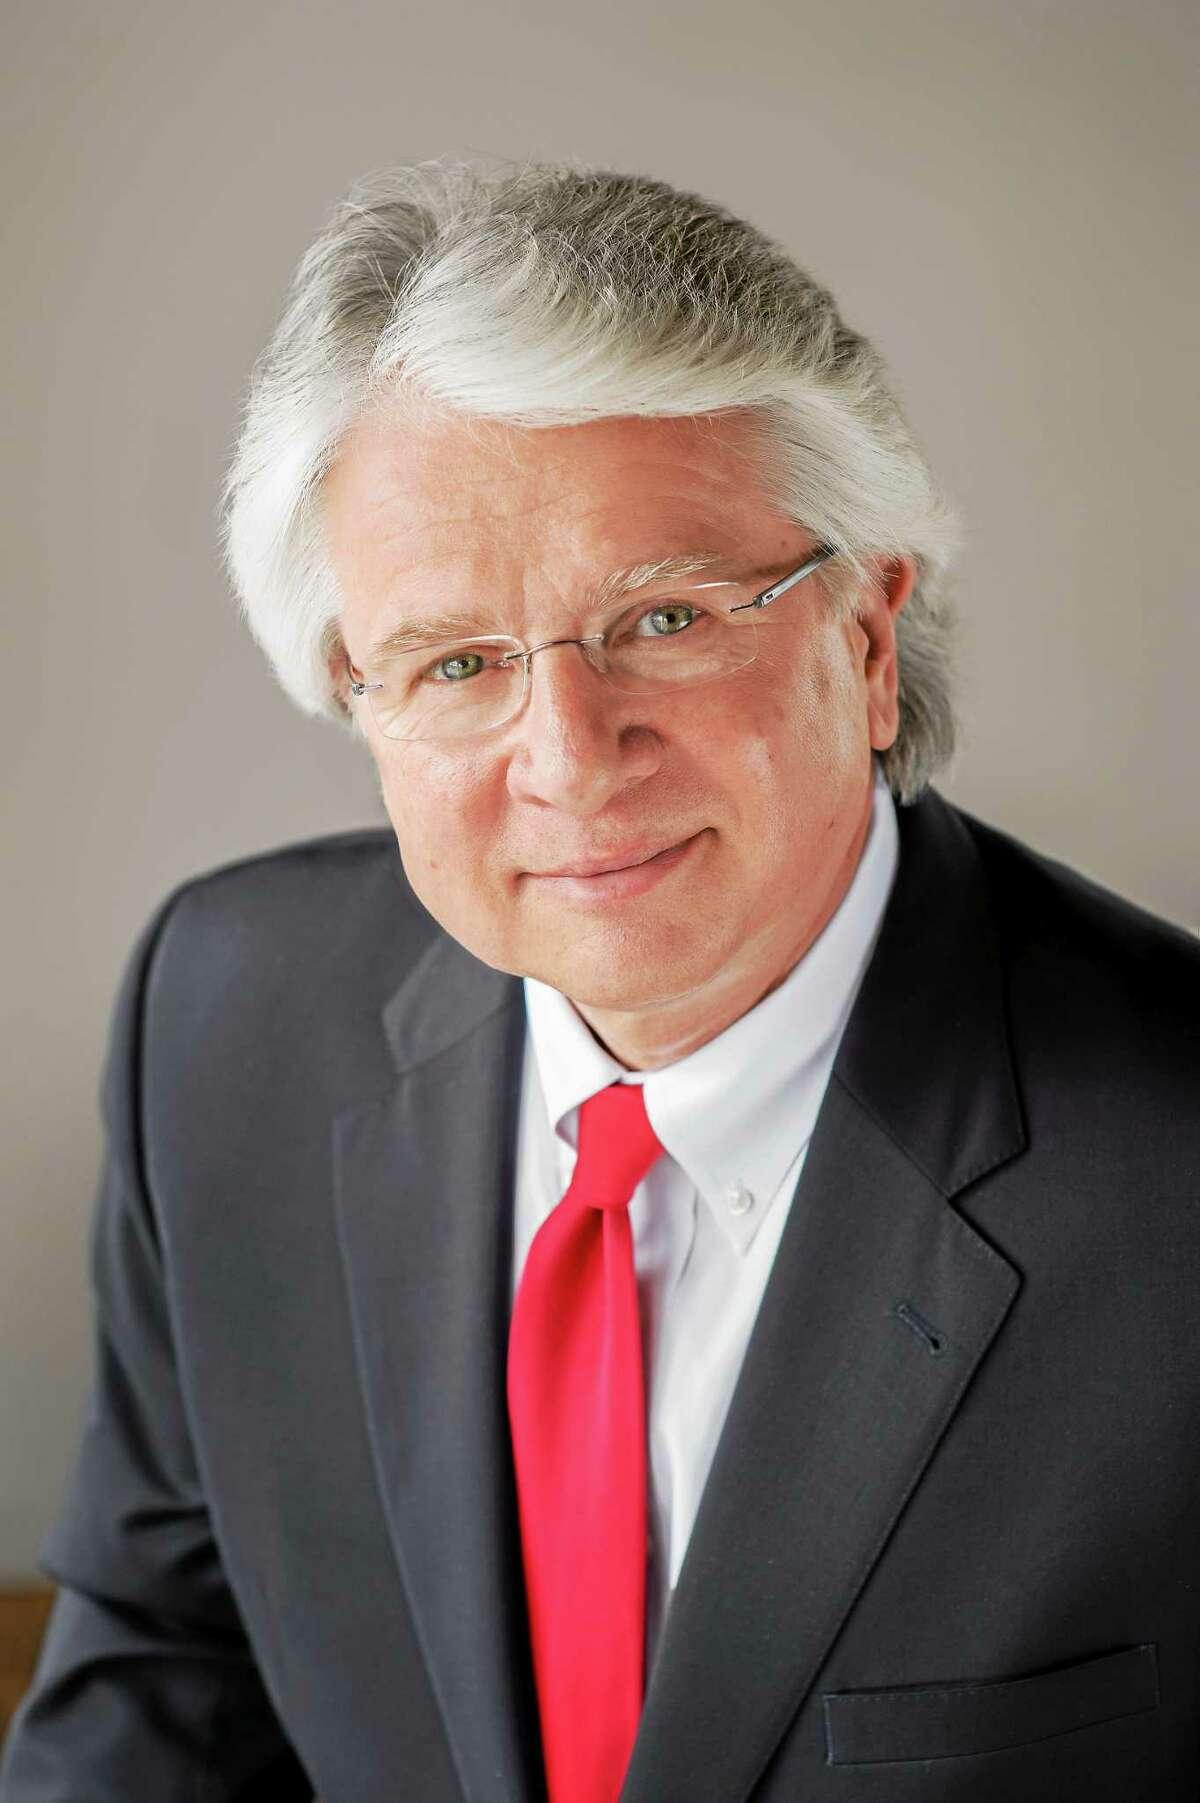 David J. Wenc